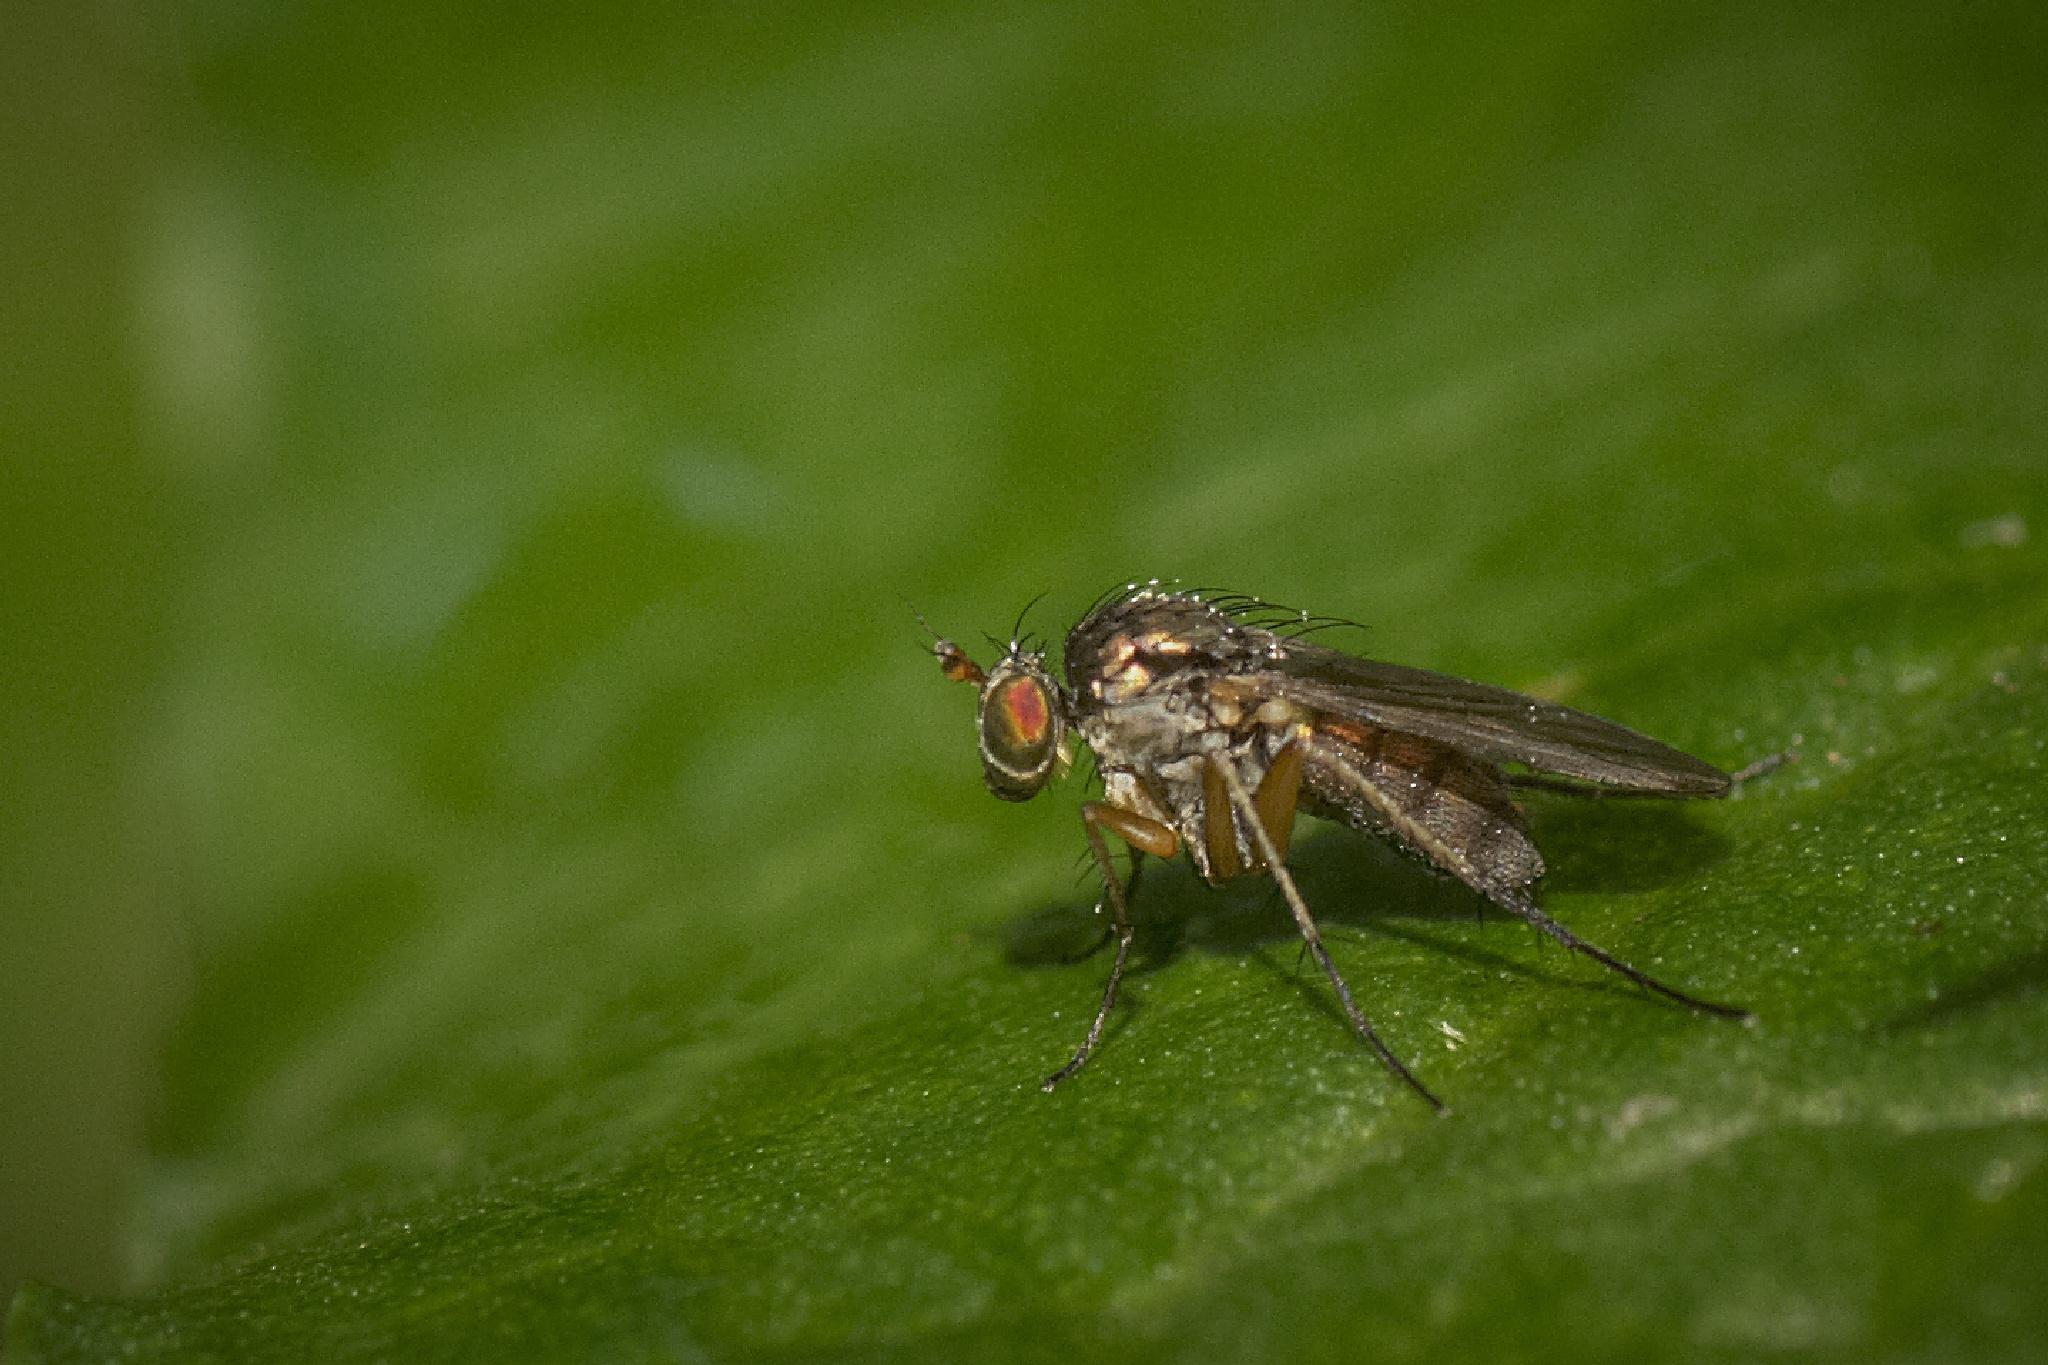 mosquito by miwwim